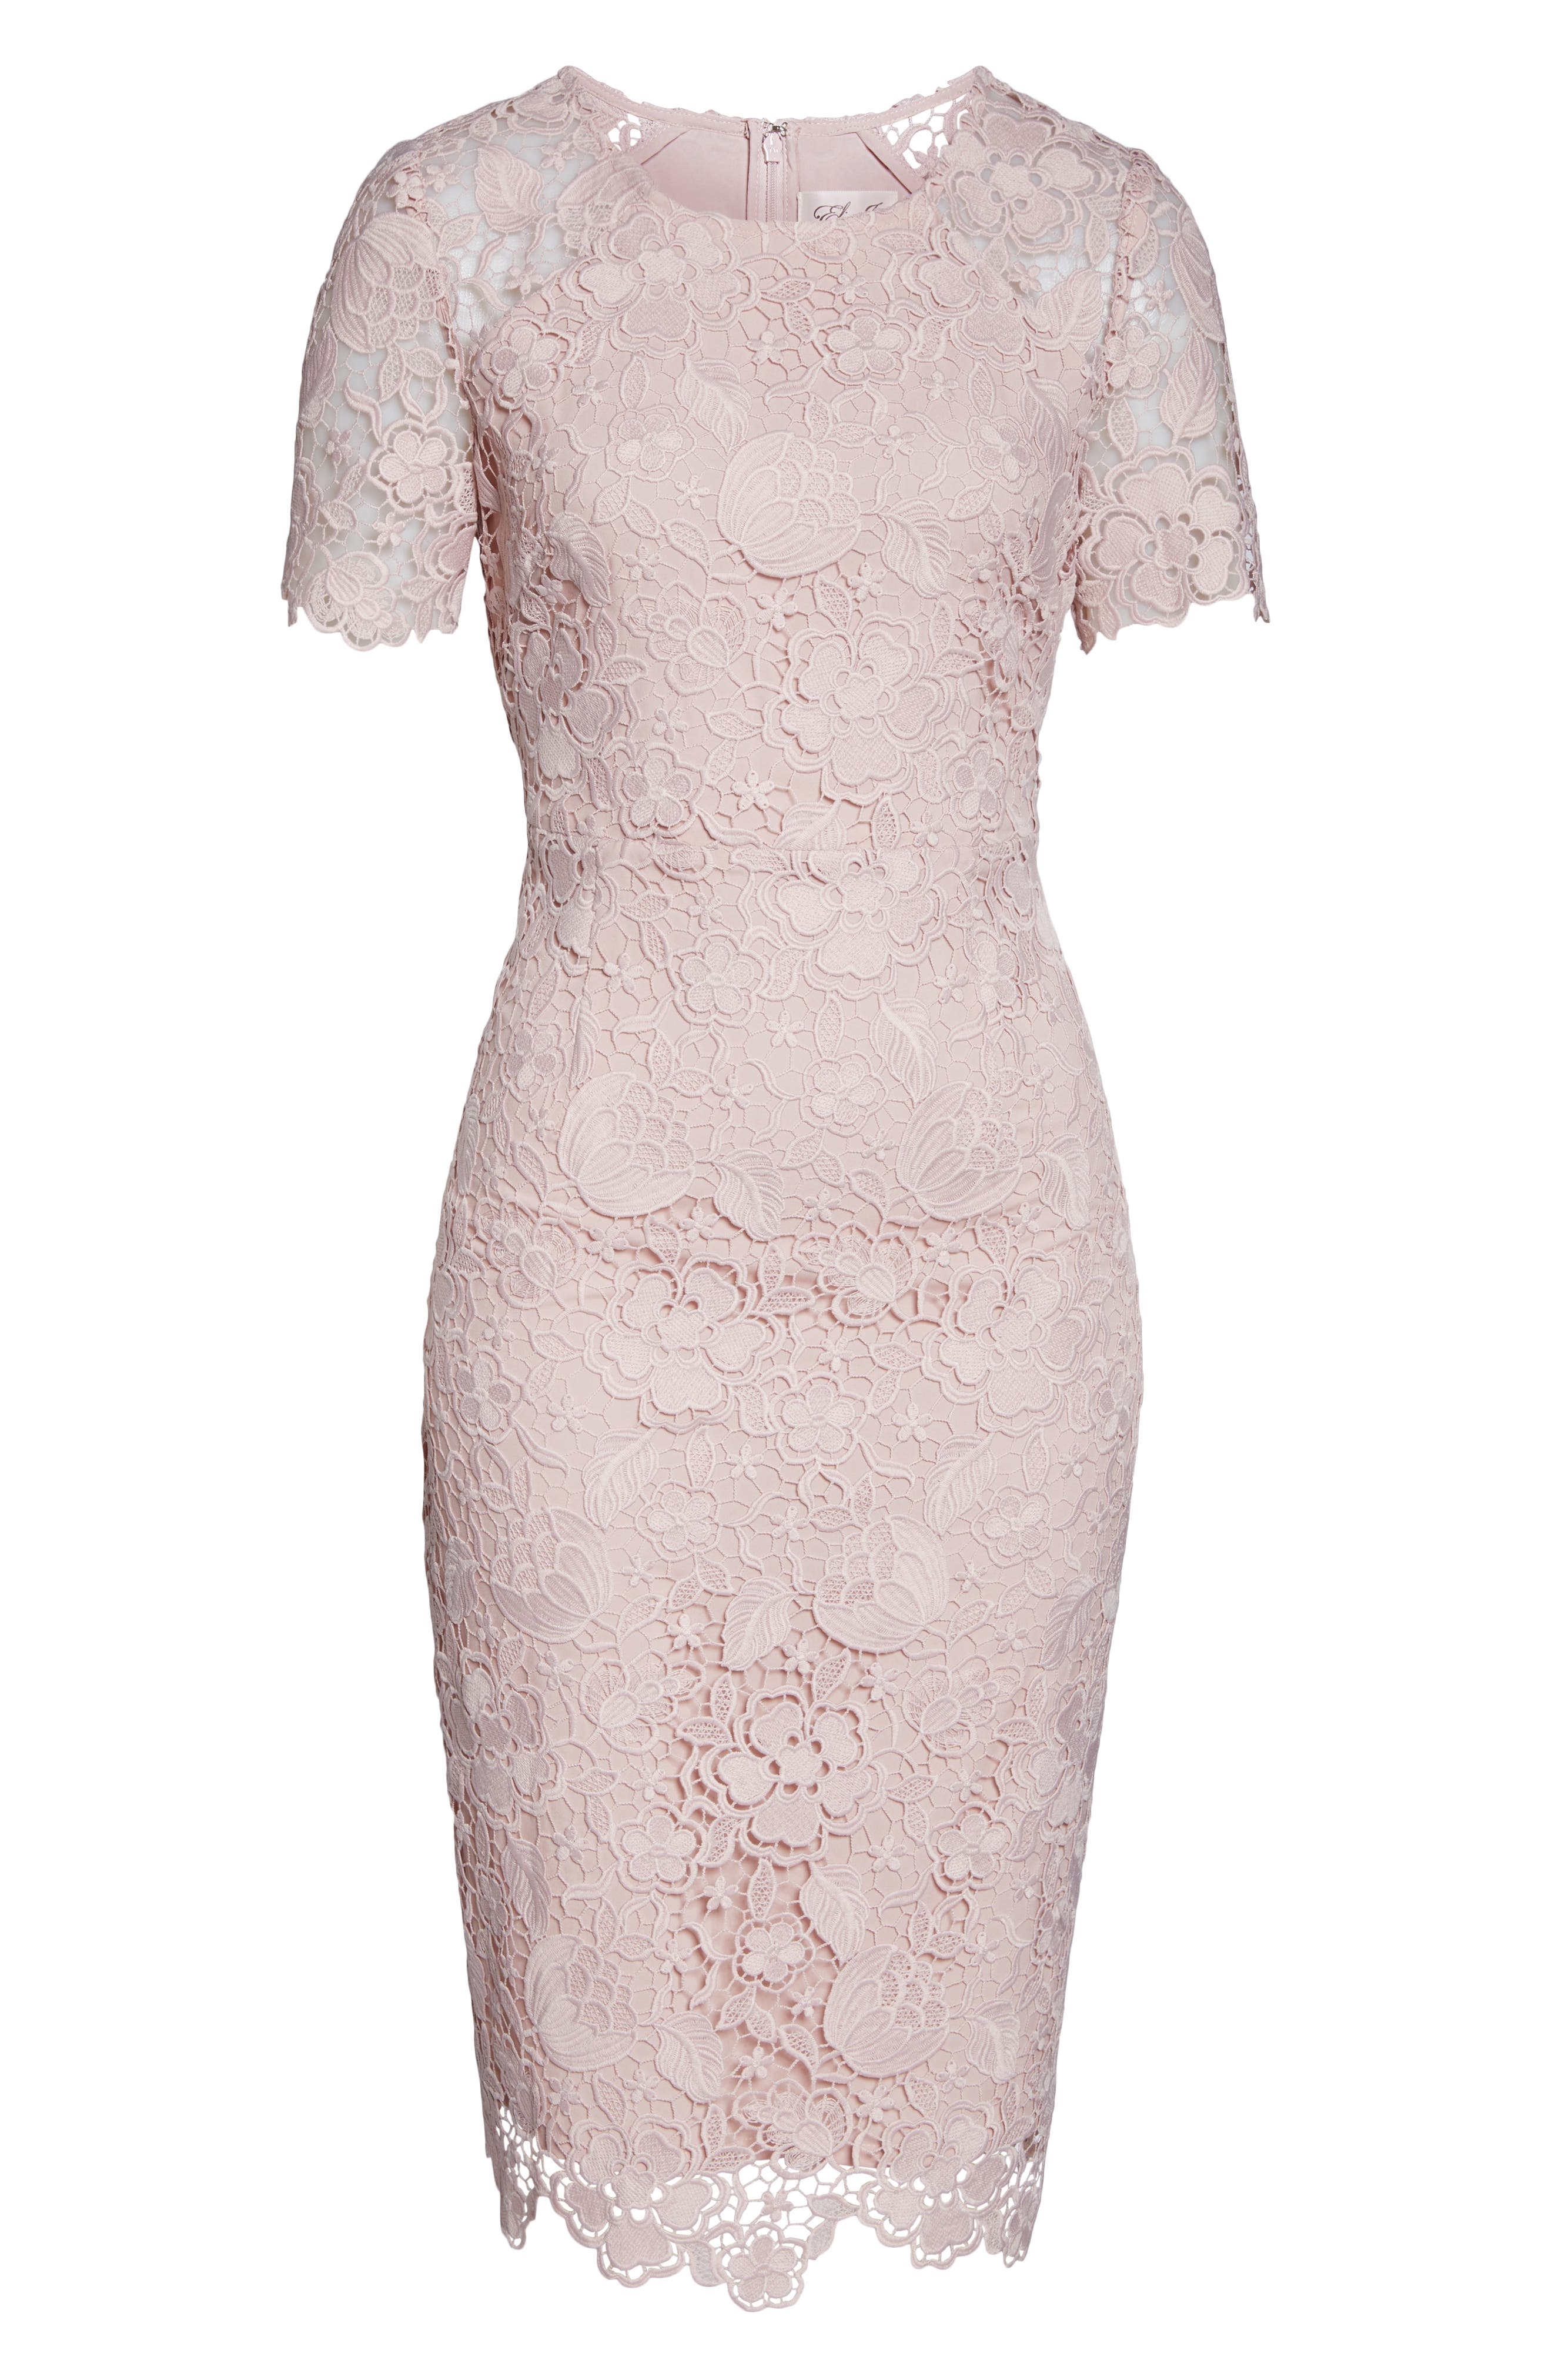 ELIZA J, Embroidered Lace Sheath Dress, Alternate thumbnail 7, color, NUDE